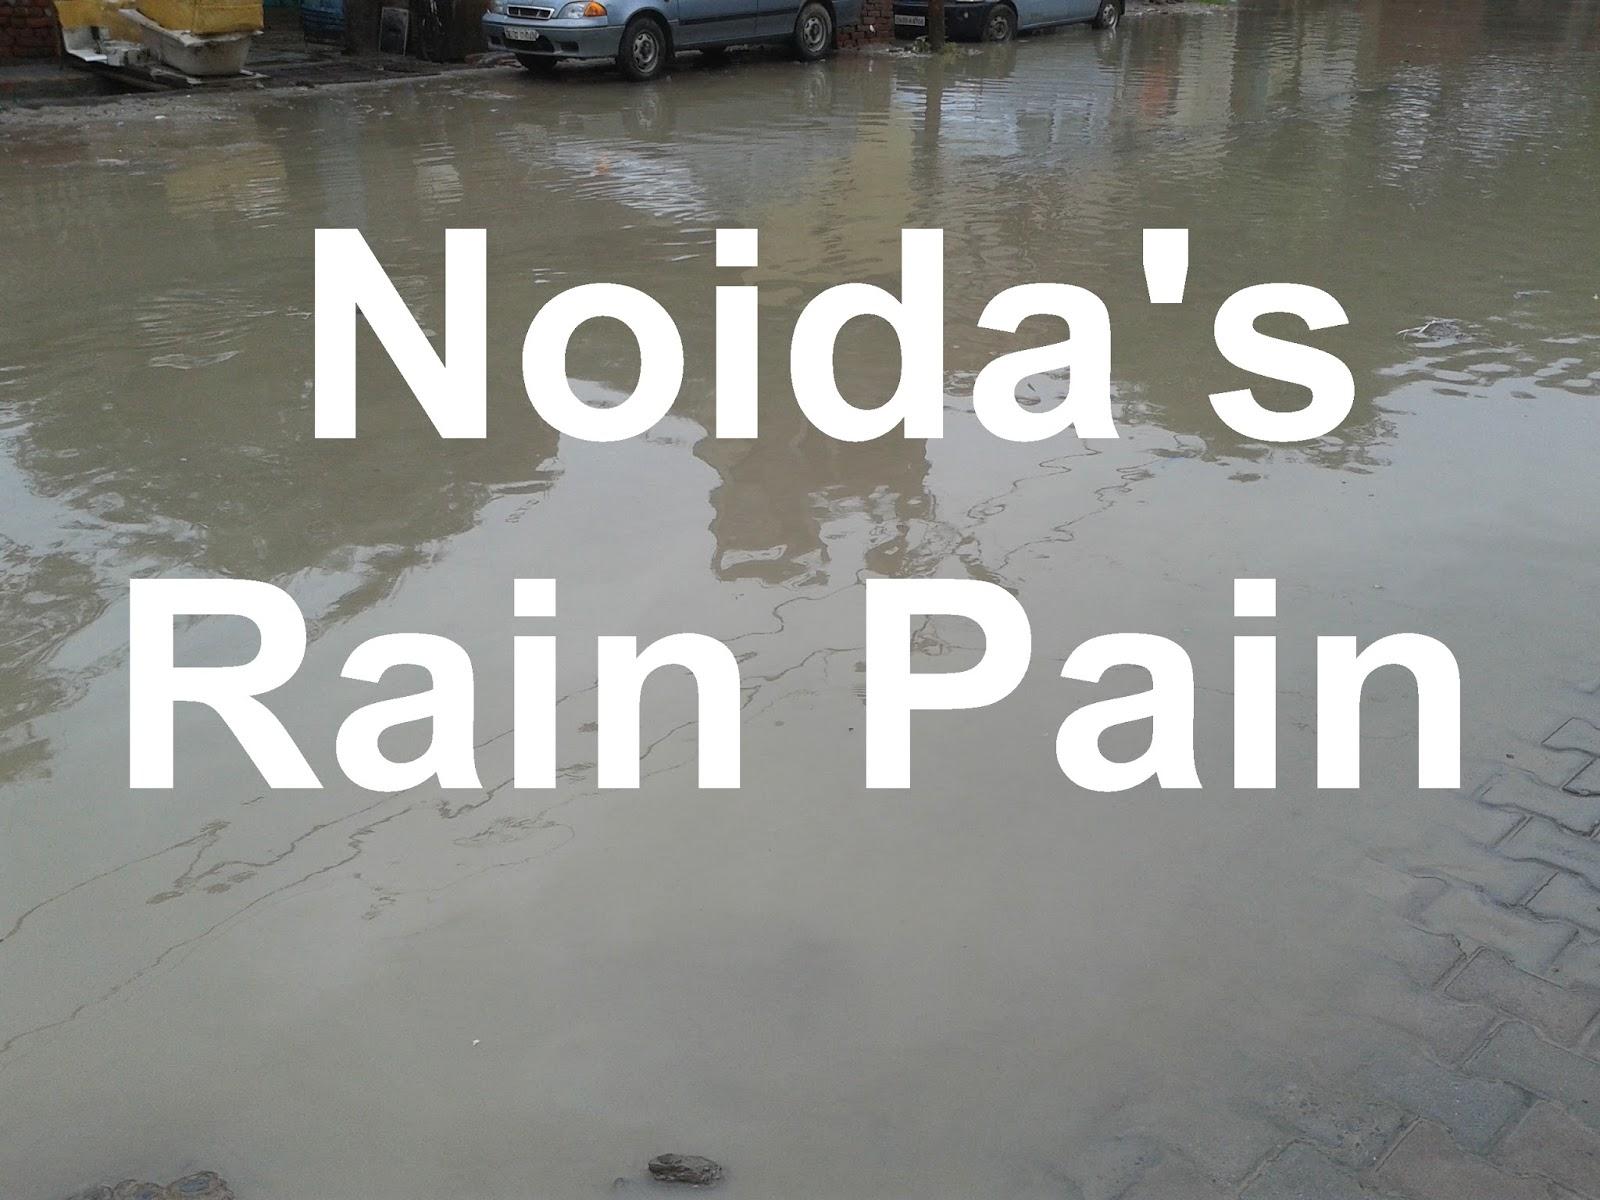 Rain Pain  in Noida